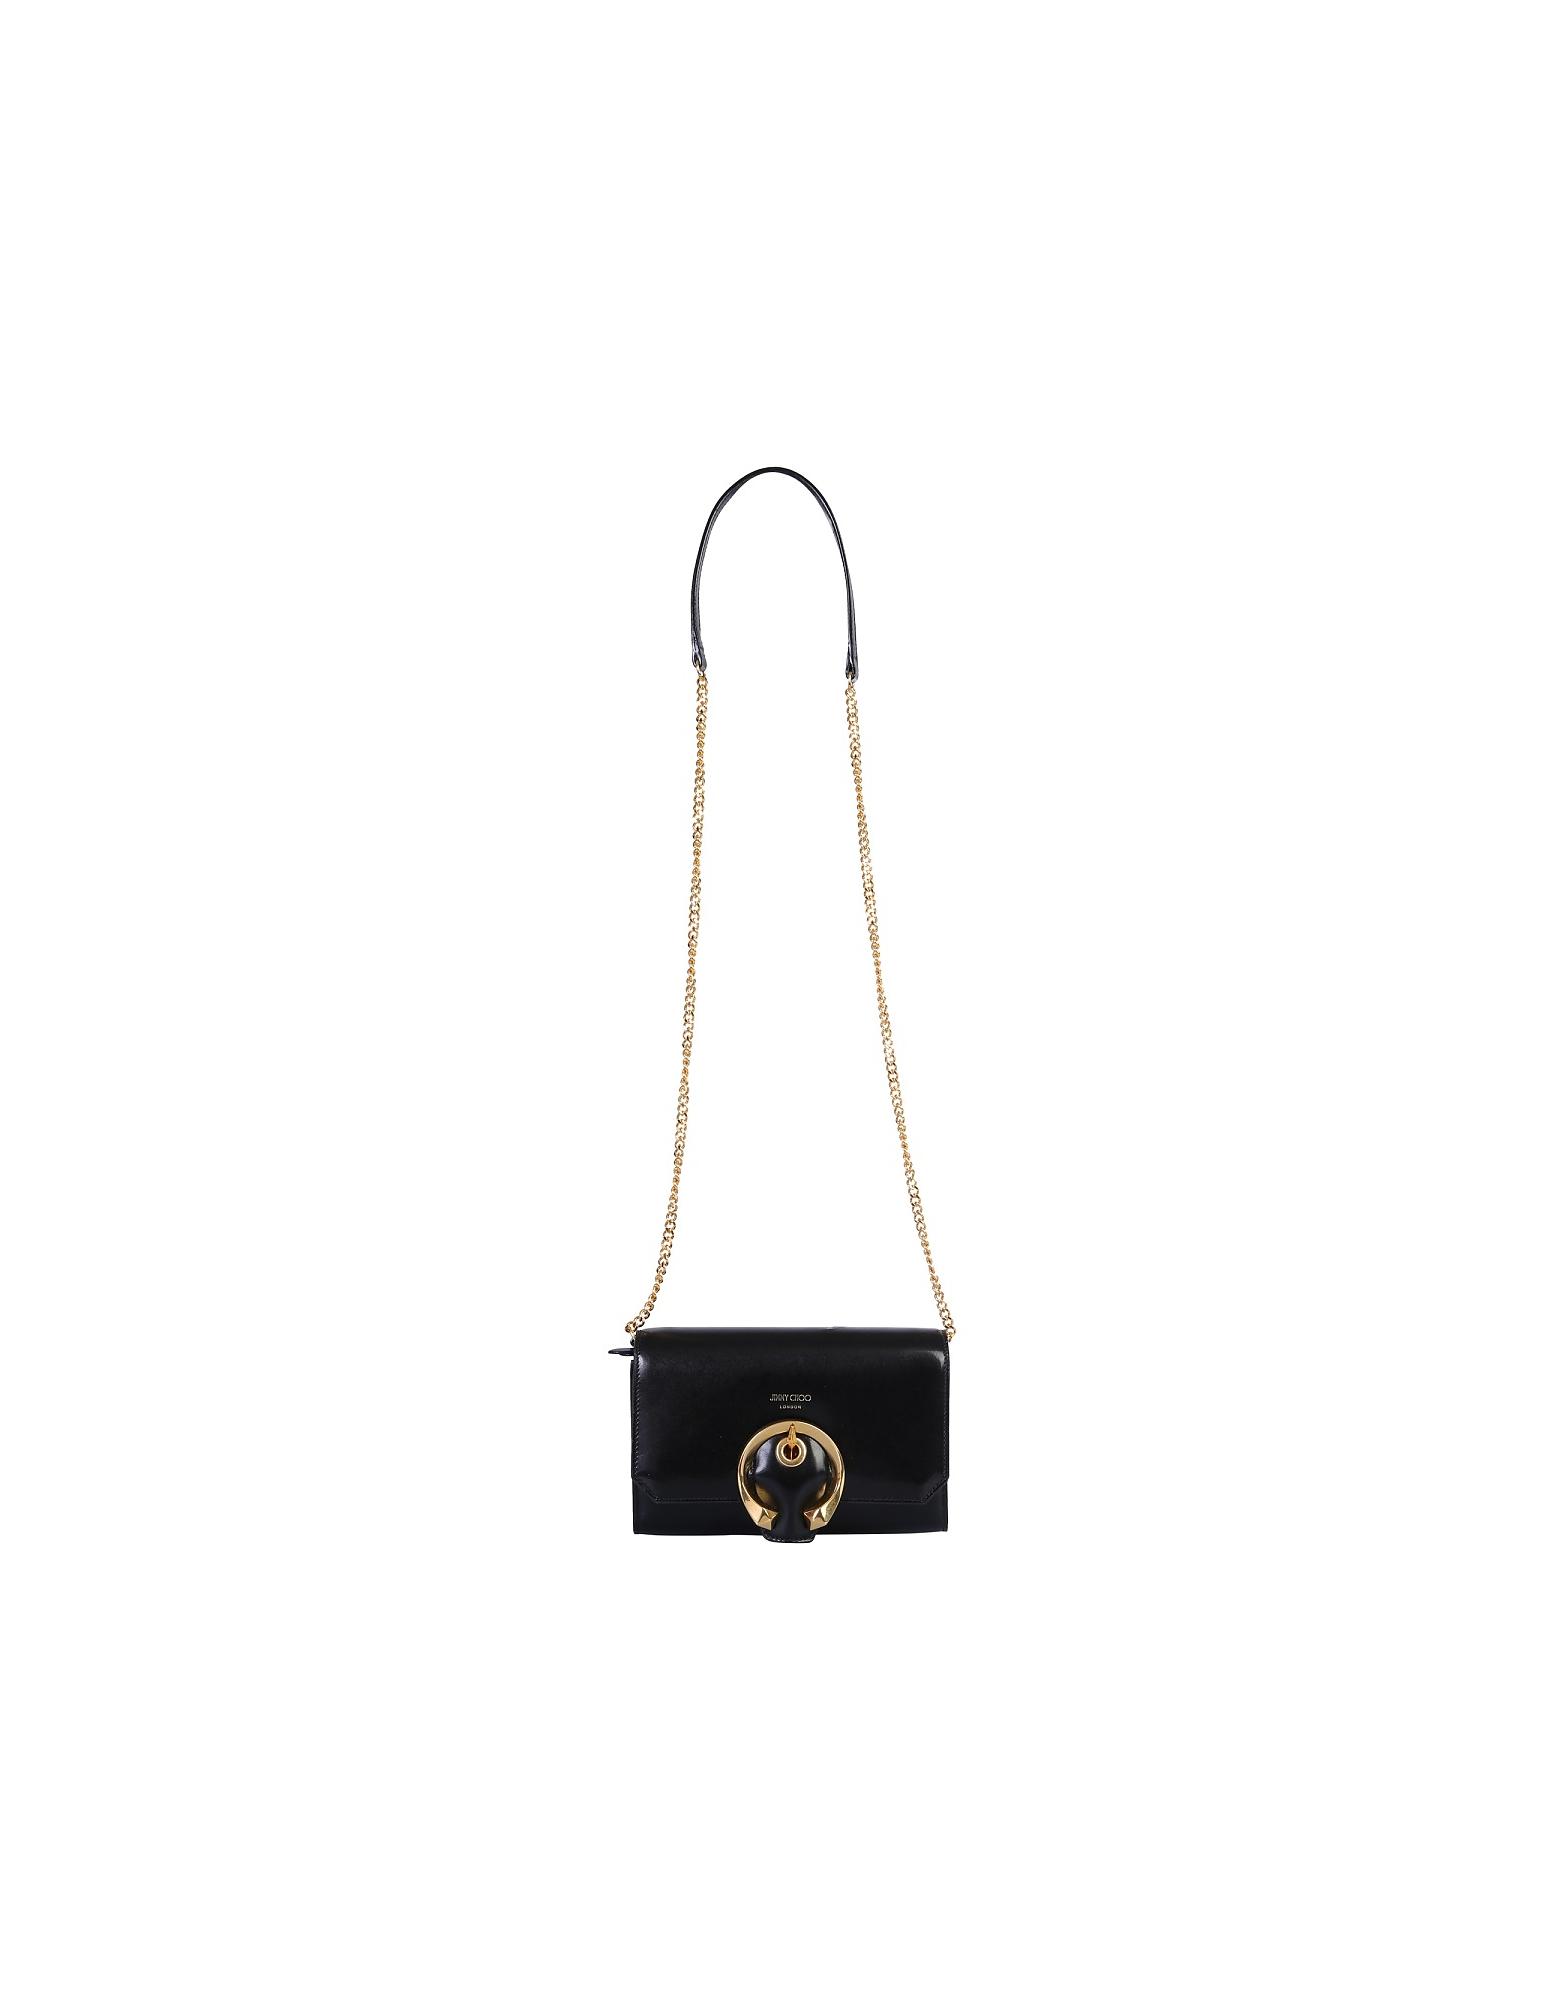 Jimmy Choo Designer Handbags, Mini Madeline Bag